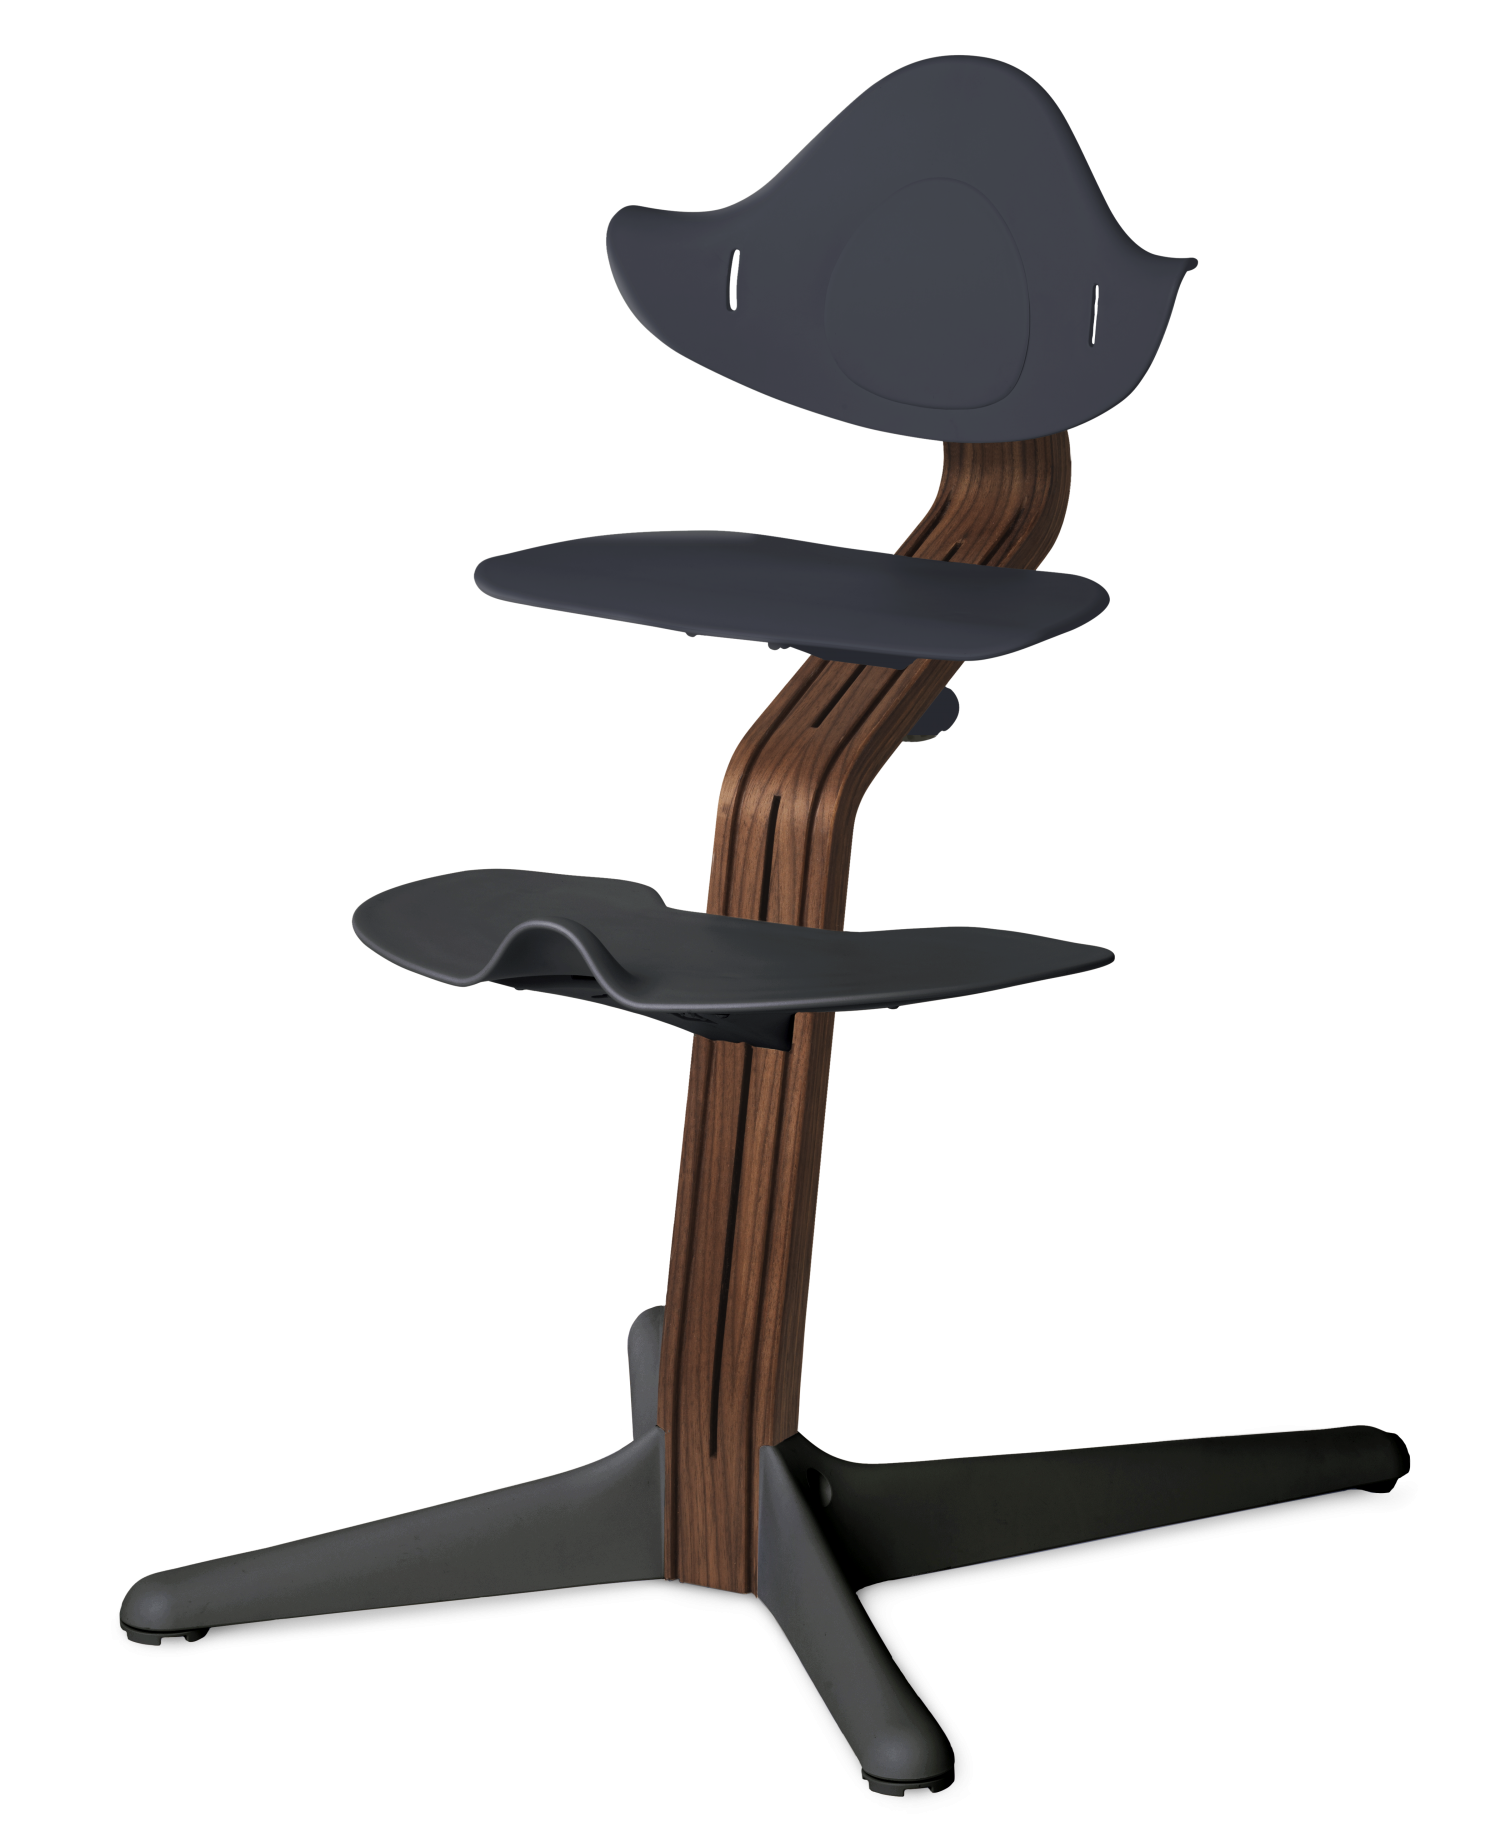 NOMI highchair meegroeistoel Basis walnoot nature oiled en stoel anthraciet